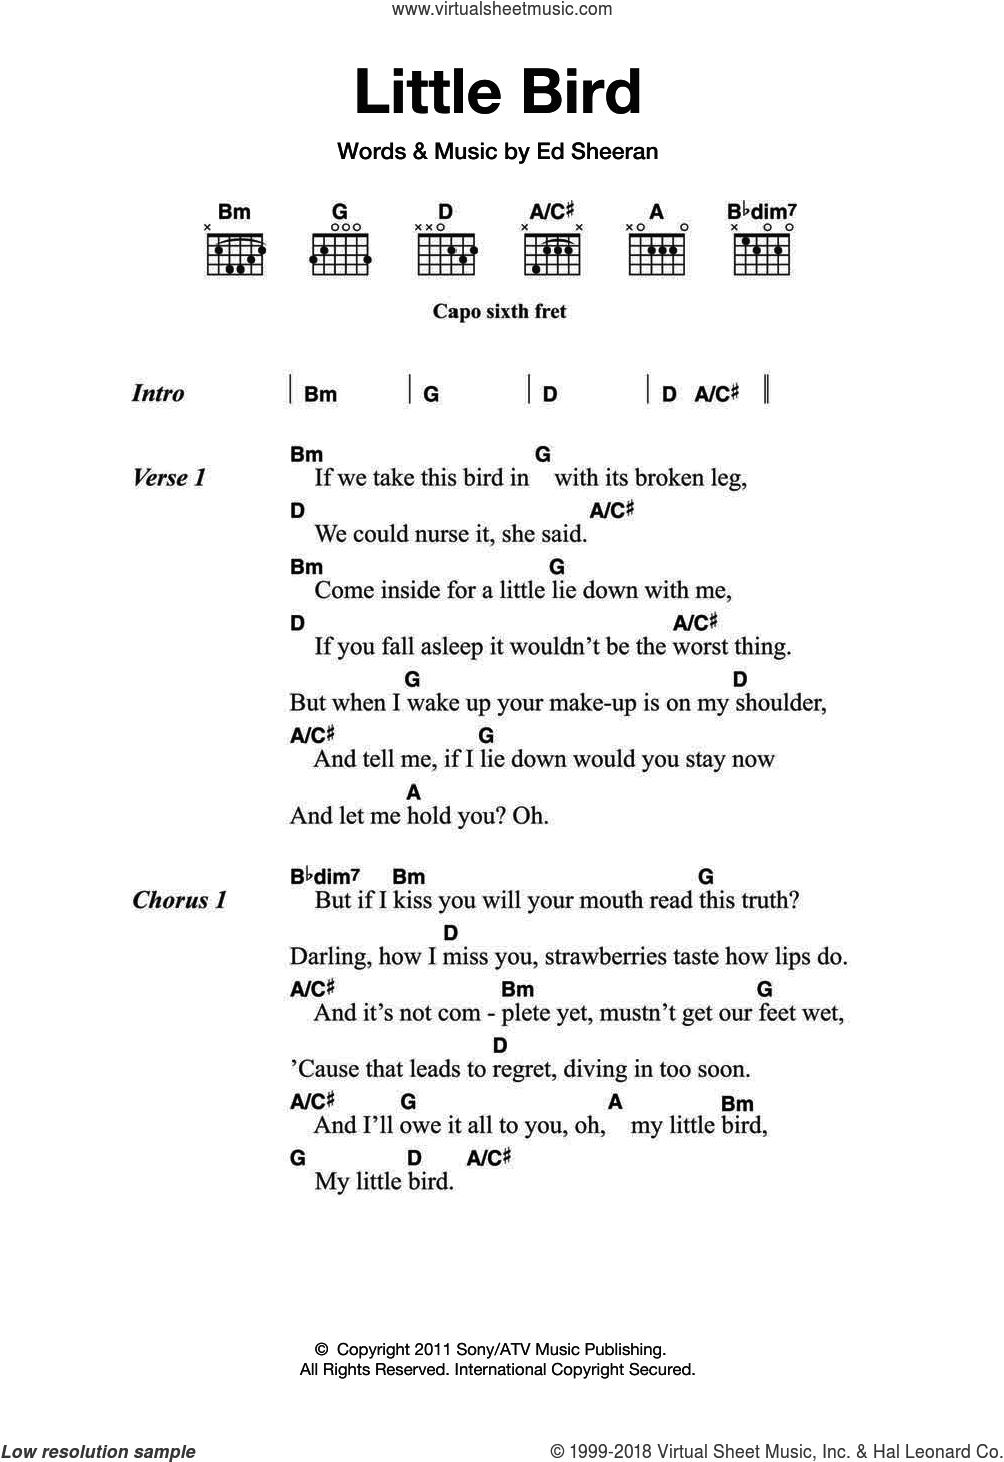 Kiss Me Chords Sheeran Little Bird Sheet Music For Guitar Chords Pdf